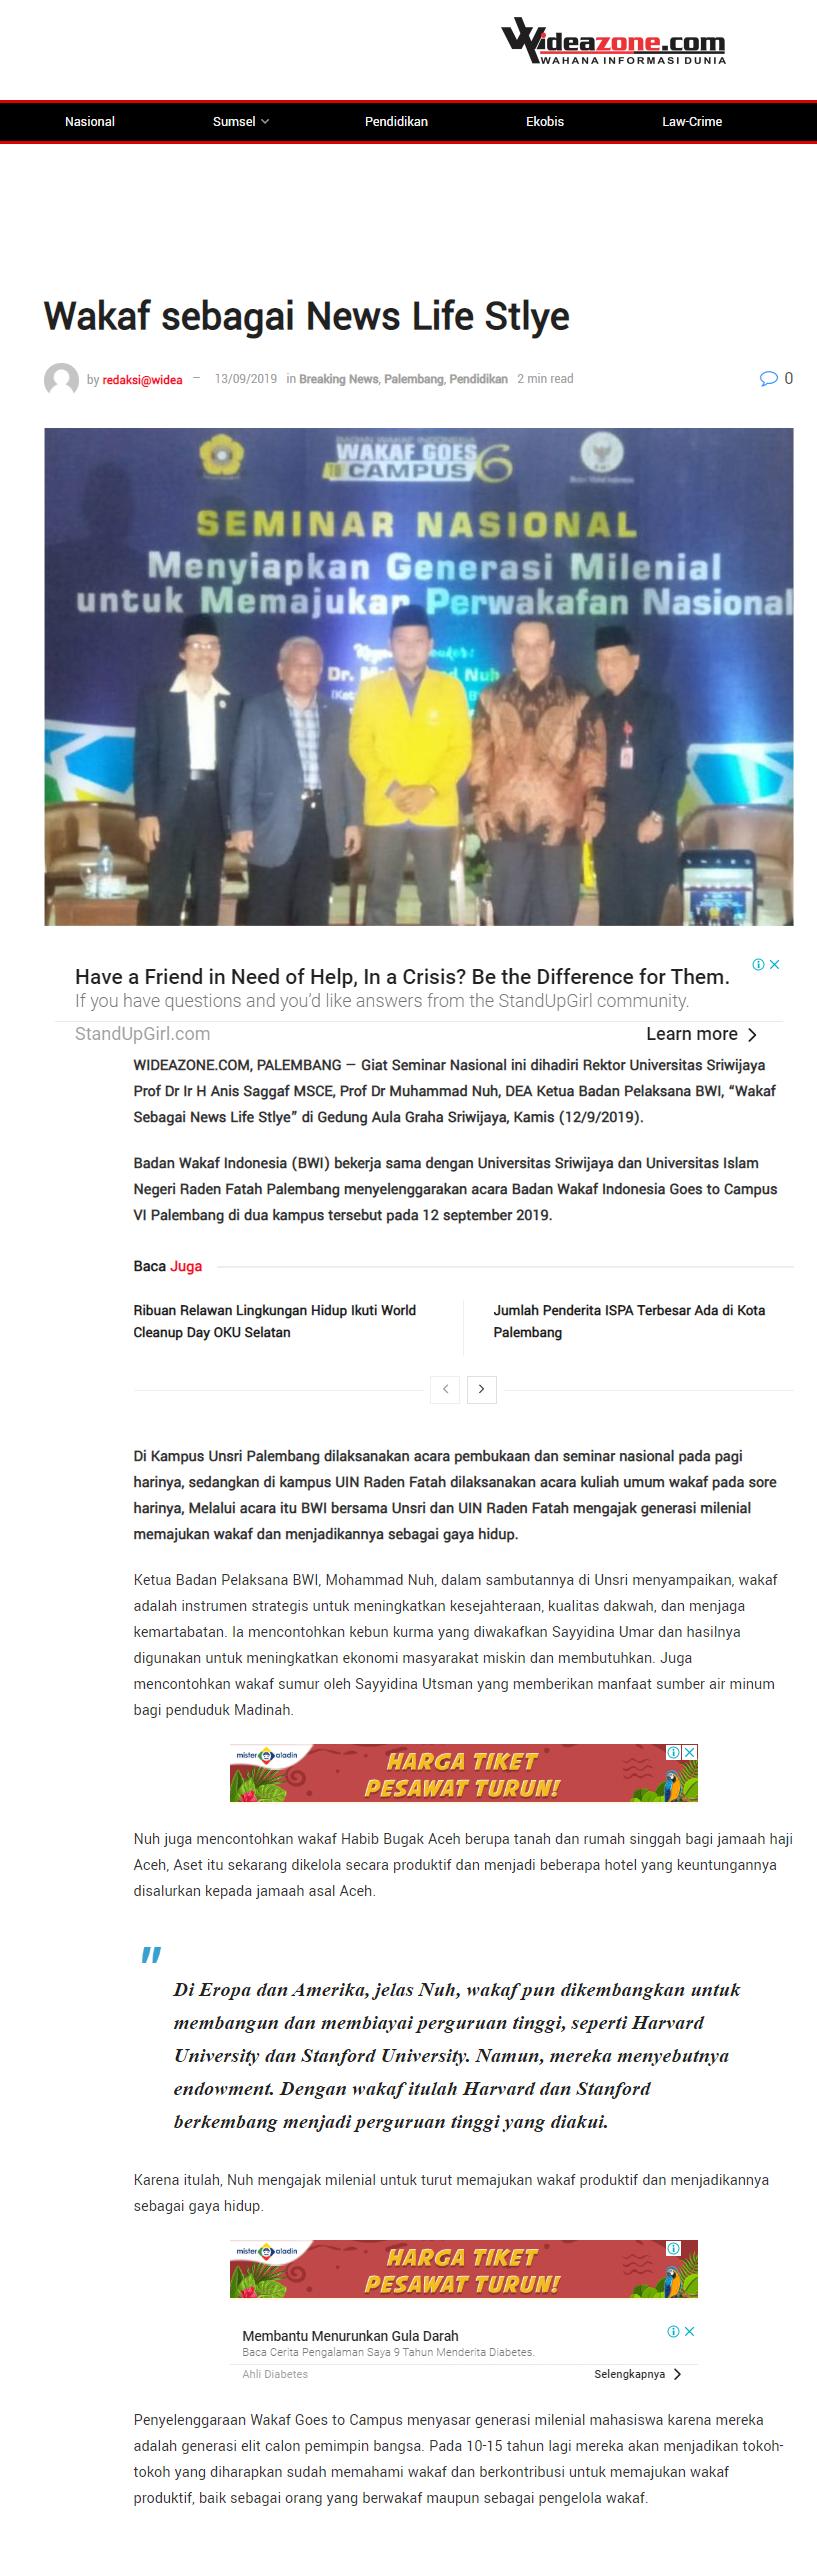 Wakaf Sebagai News Life Style  - screenshot wideazone - Wakaf Sebagai News Life Style